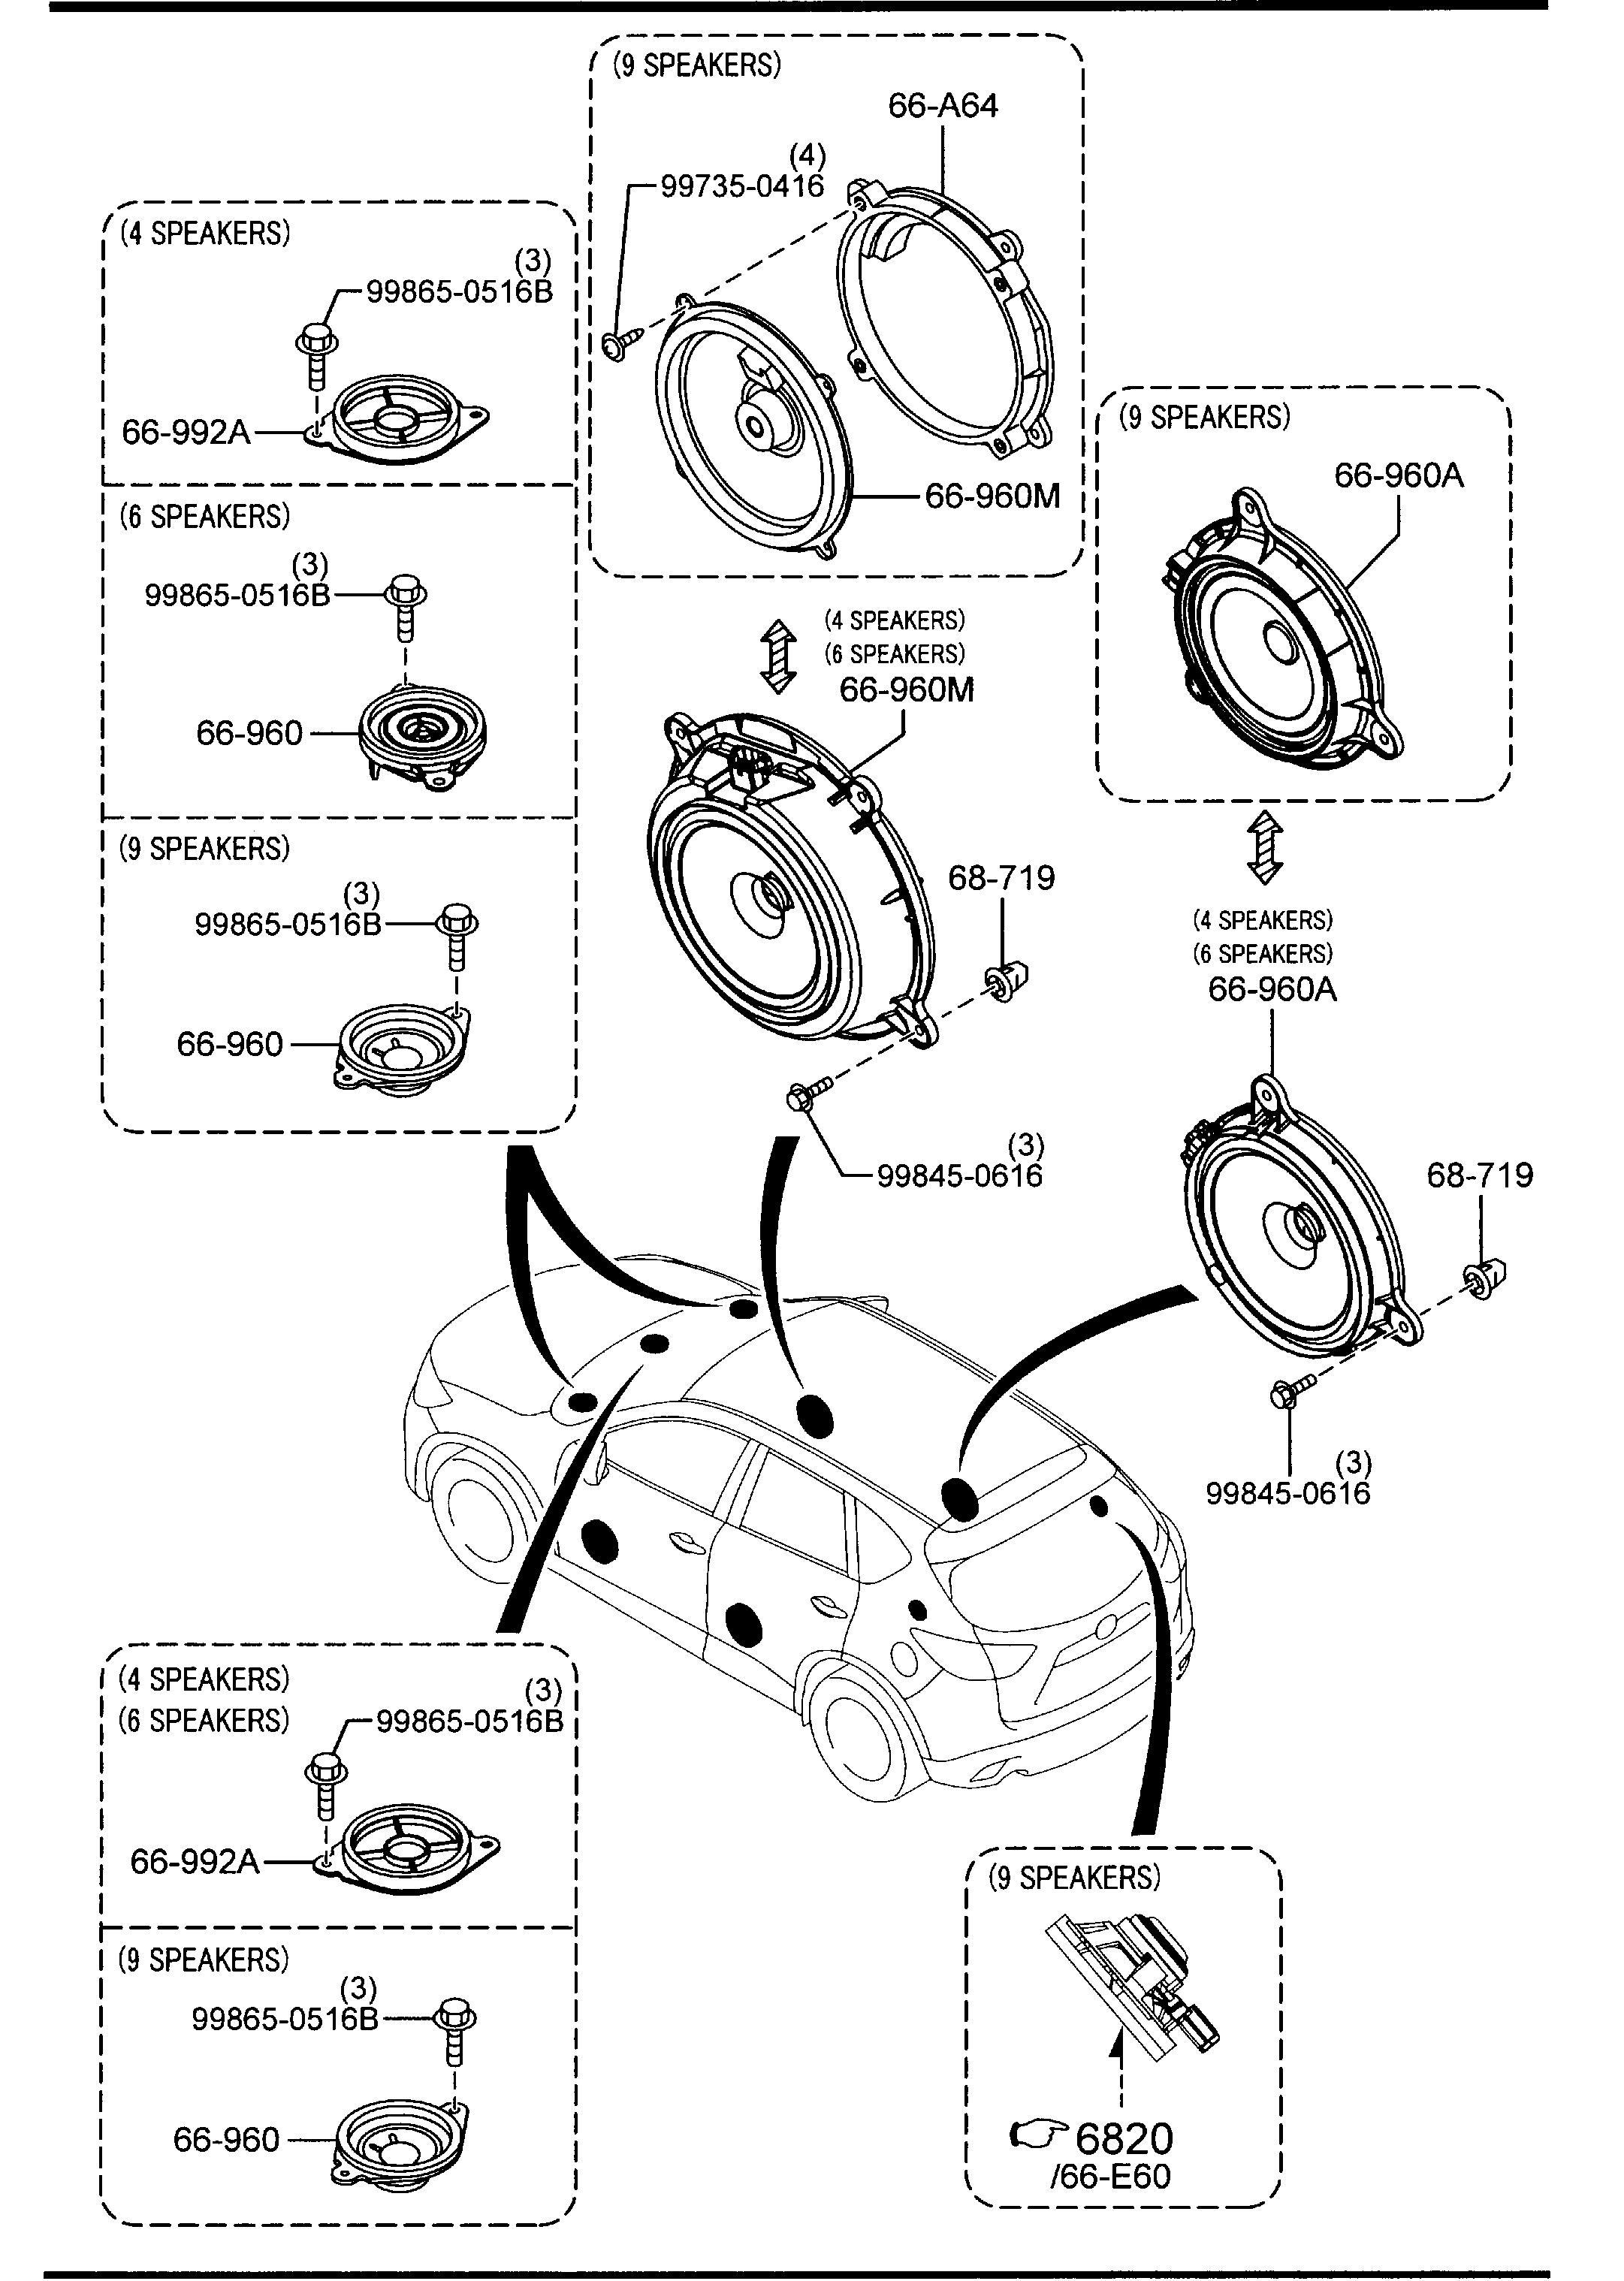 2014 Mazda CX-5 AUDIO SYSTEMS (ANTENNA & SPEAKER)